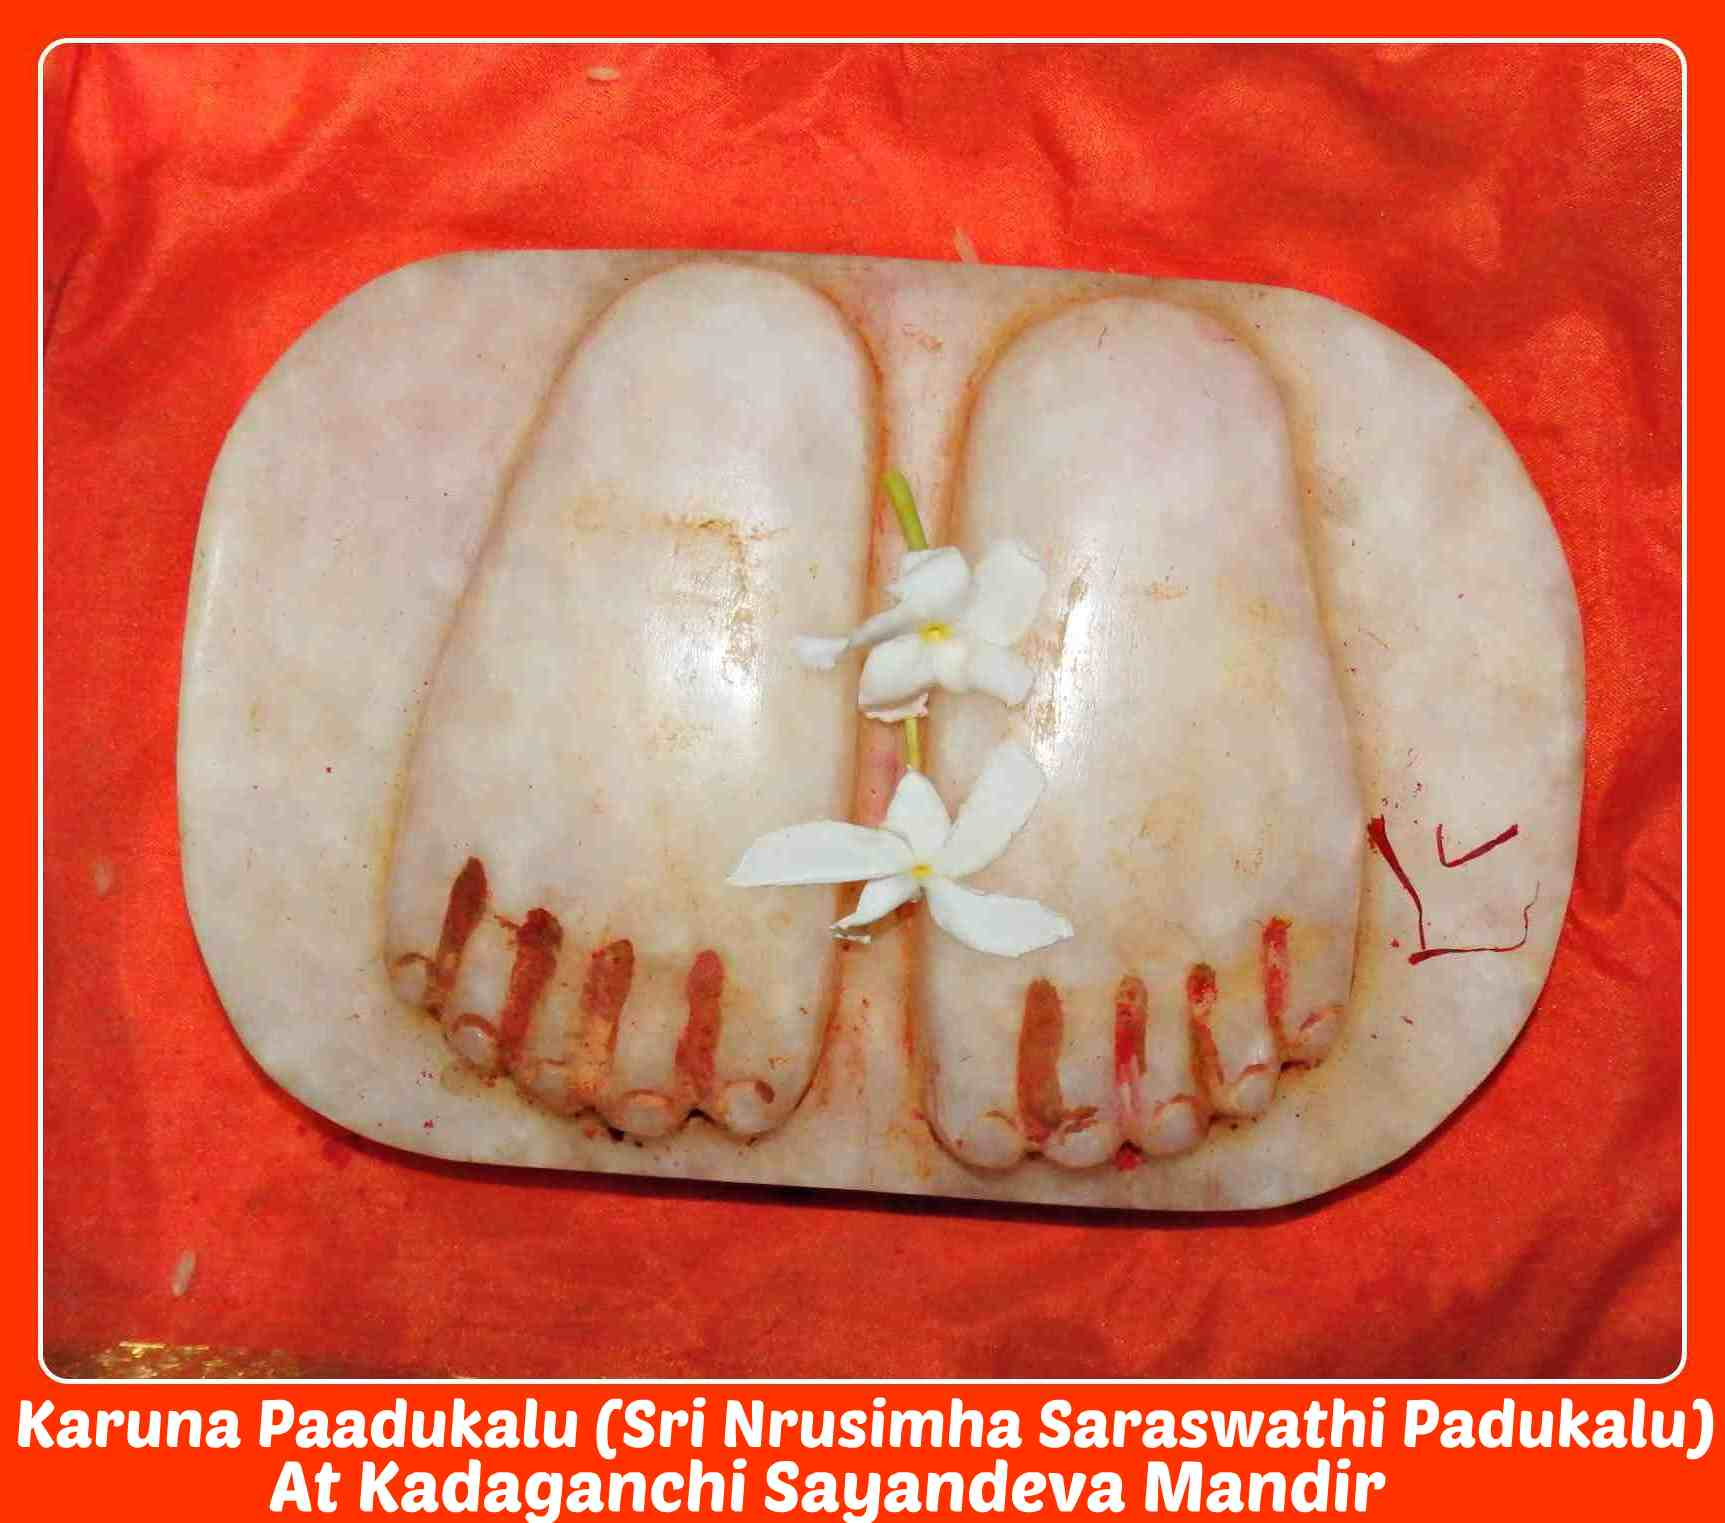 KarunaPadukalu of Kadaganchi